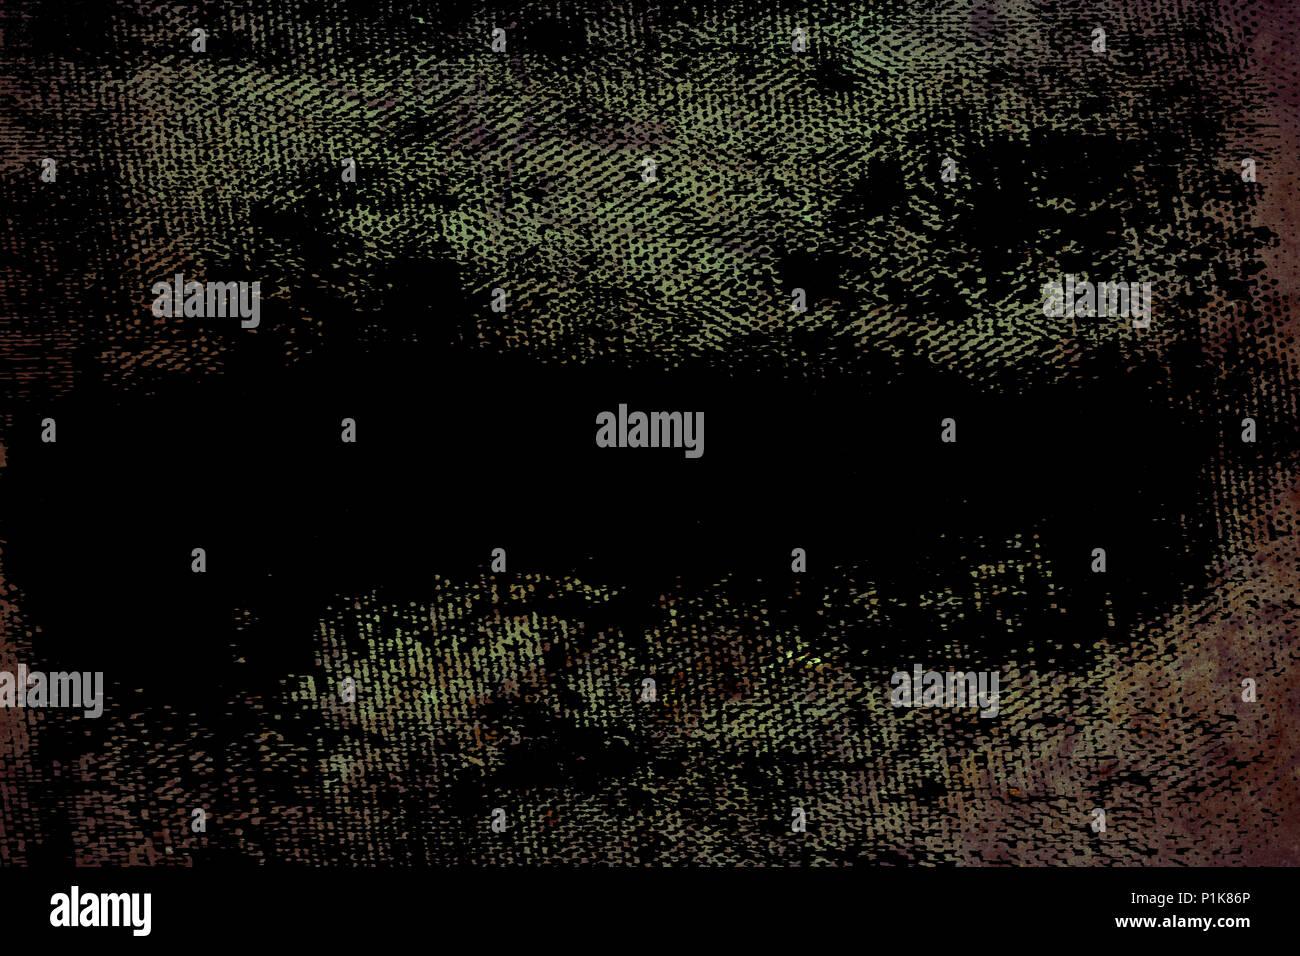 Poster texture immagini & poster texture fotos stock alamy